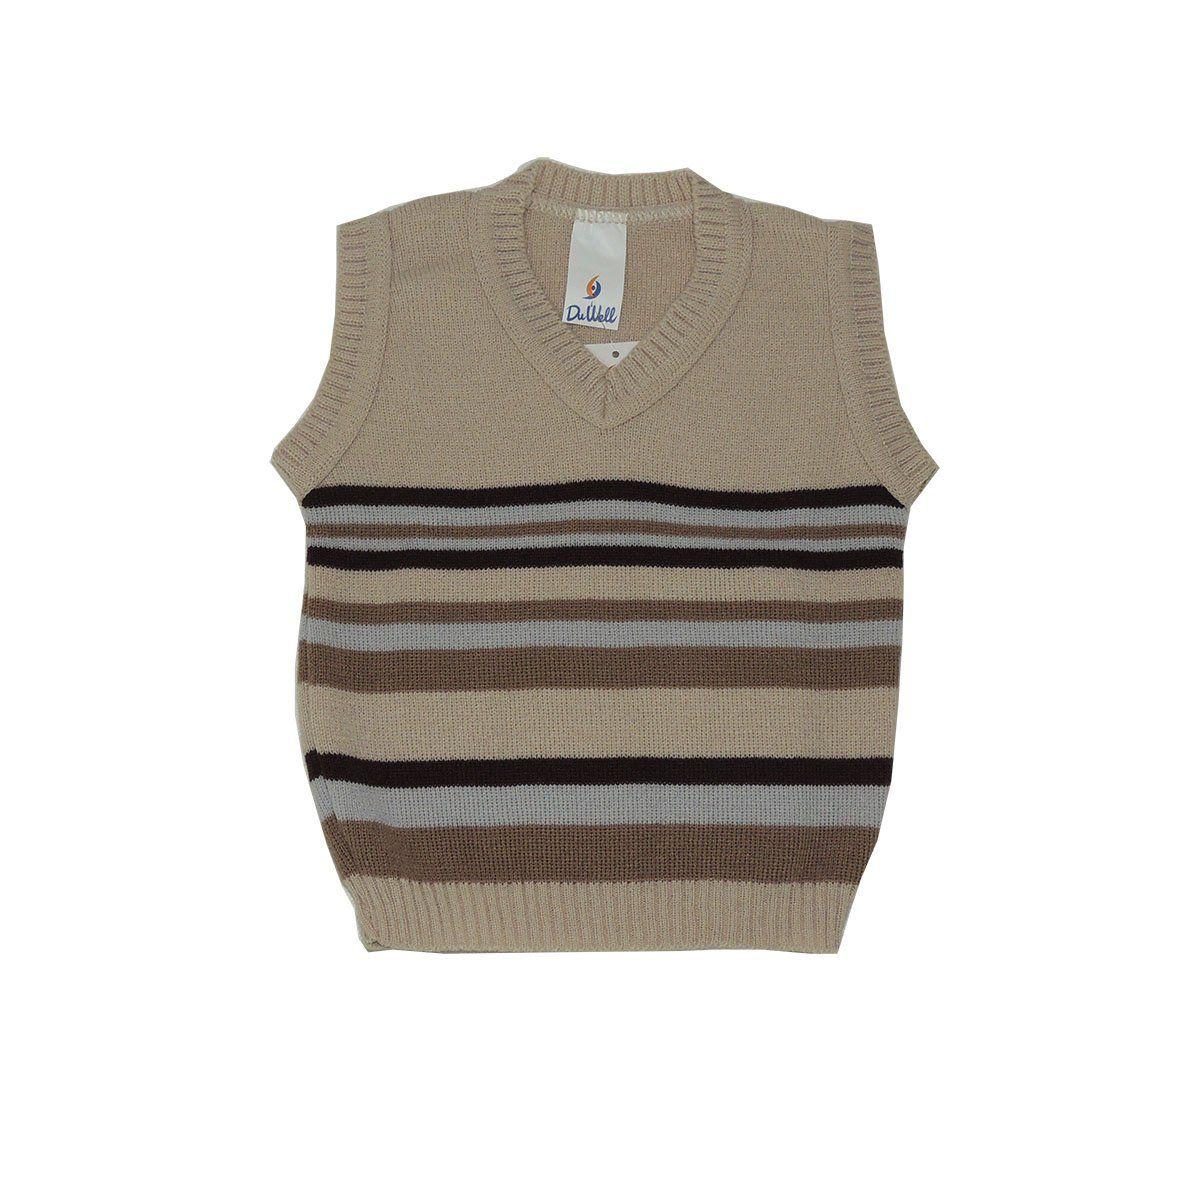 Colete Infantil de Lã com Listras Masculino